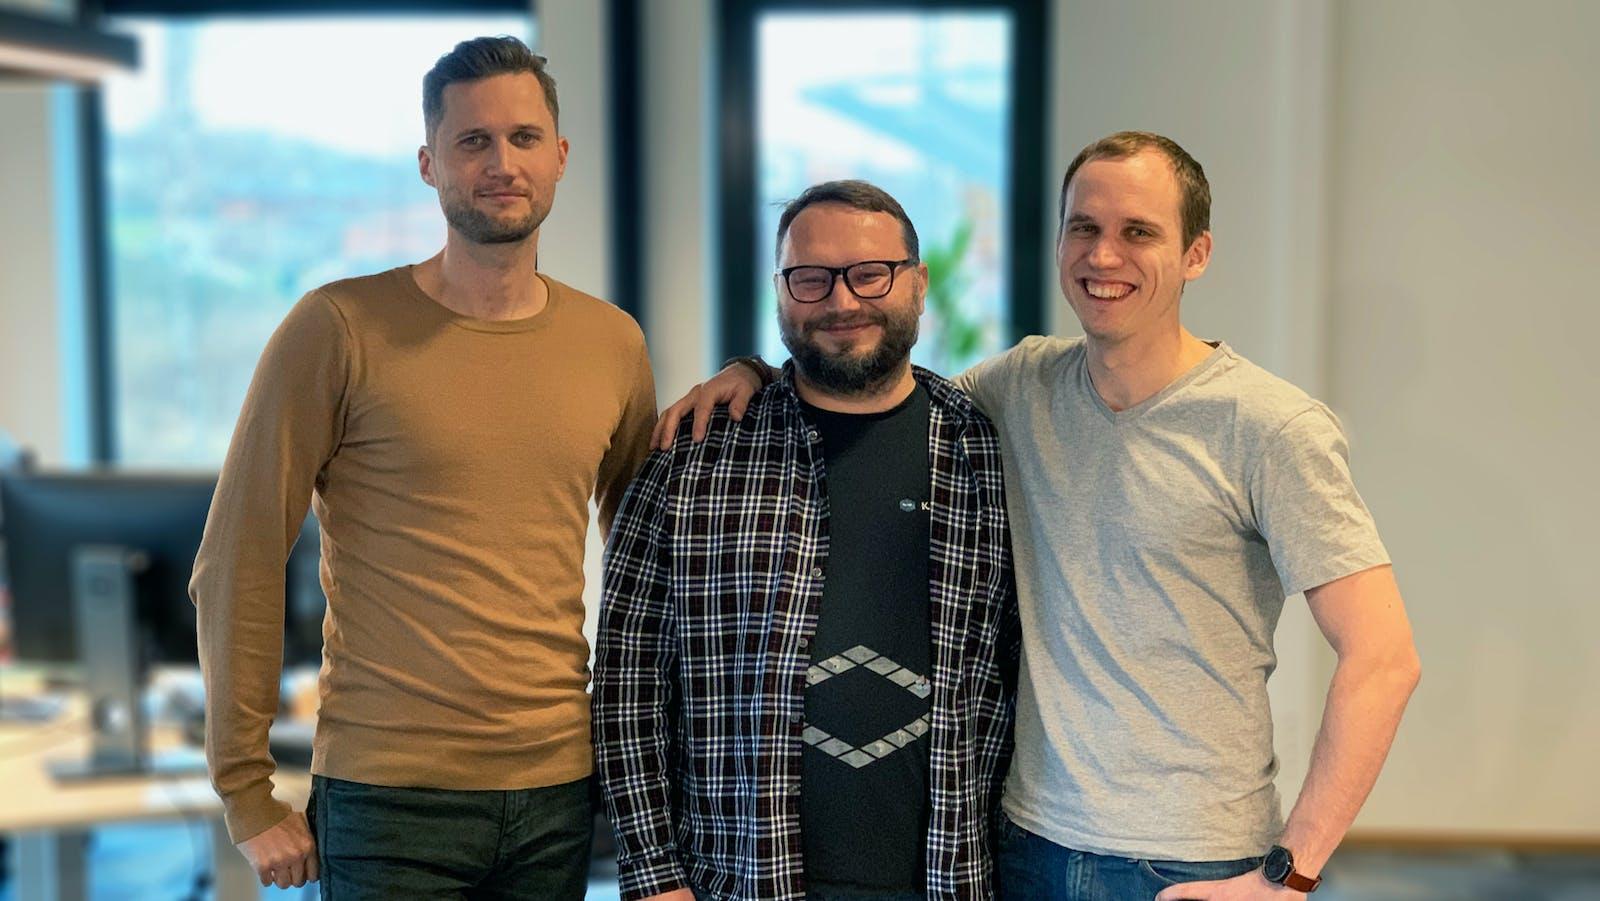 Katana's Kristjan Vilosius (from left to right), Priit Kaasik and Hannes Kert. Photo provided by Katana